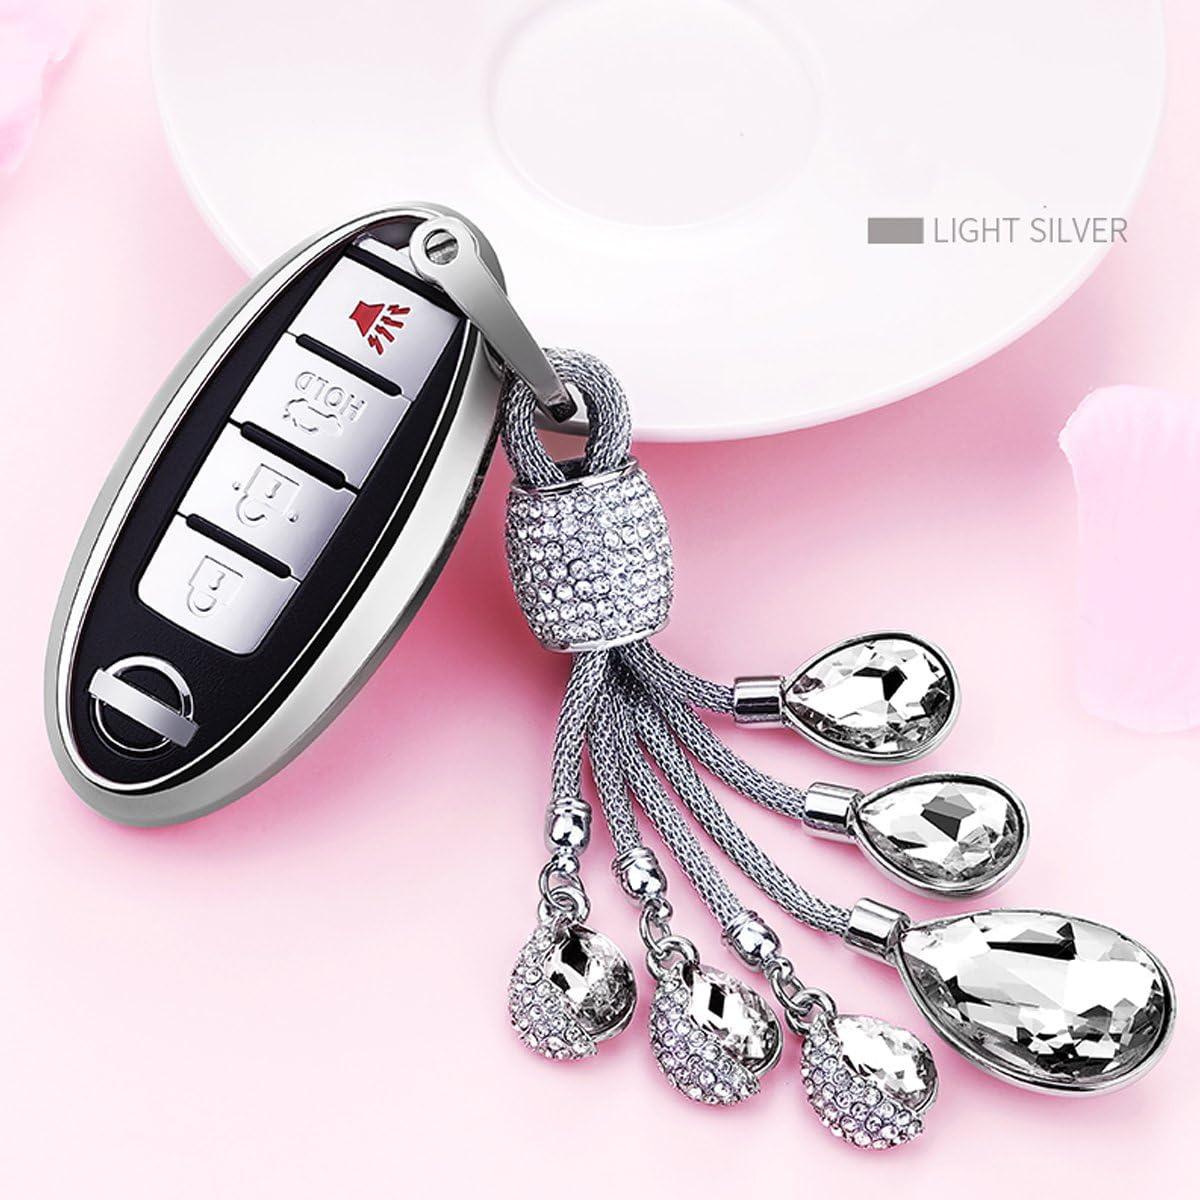 Nissan Murano Key Ring Pink and Chrome Diamond Bling Keychain